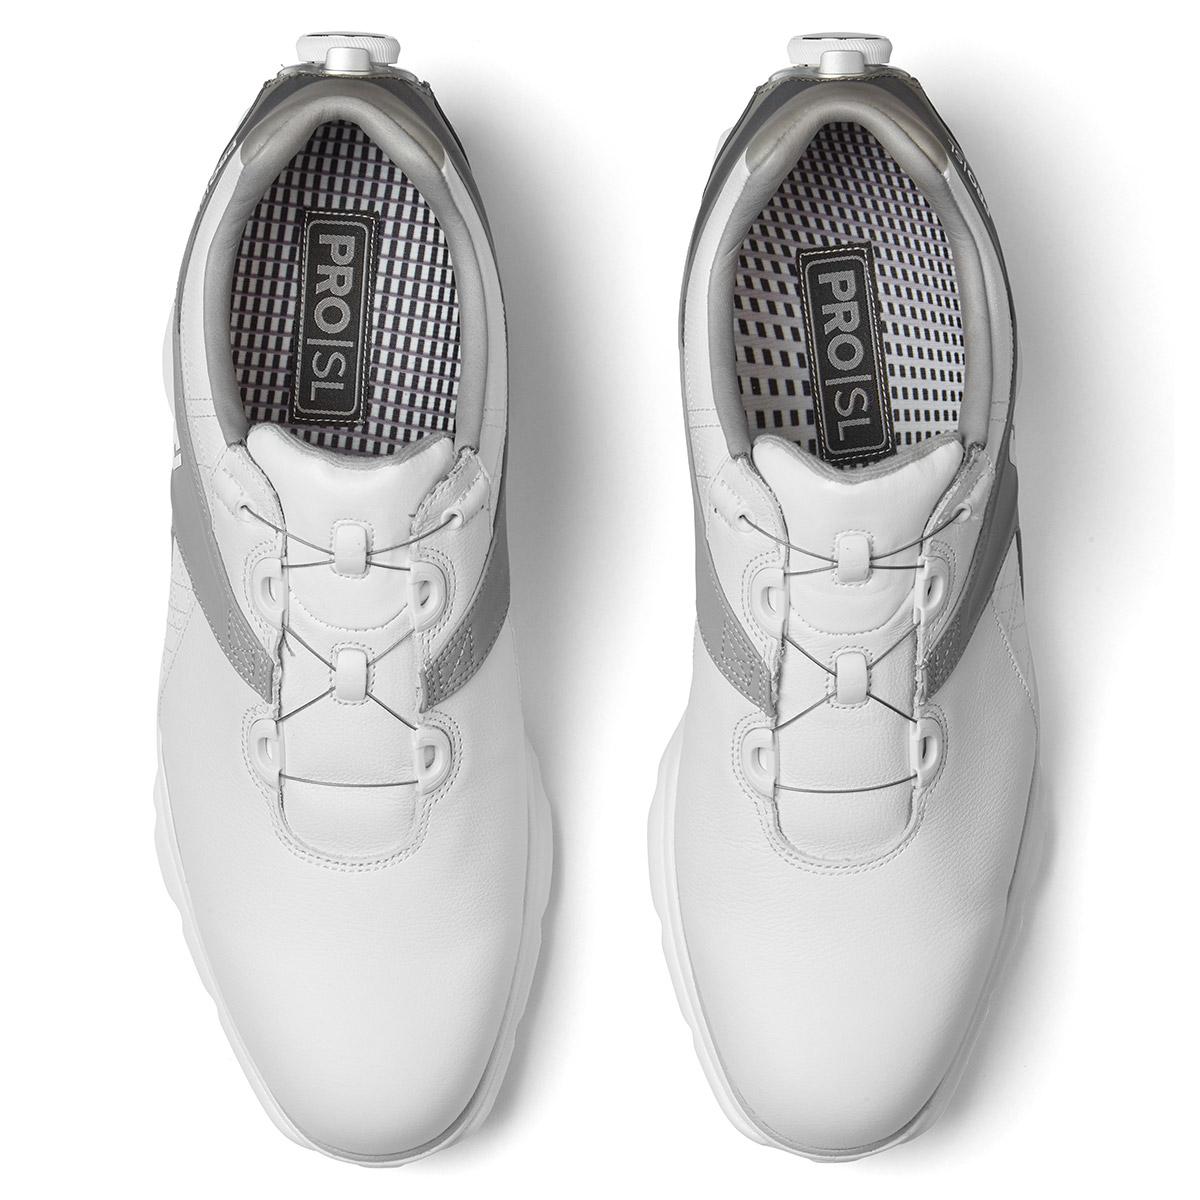 355230-WhiteGrey-FootJoy-Pro-SL-BOA-Shoes-2020-3